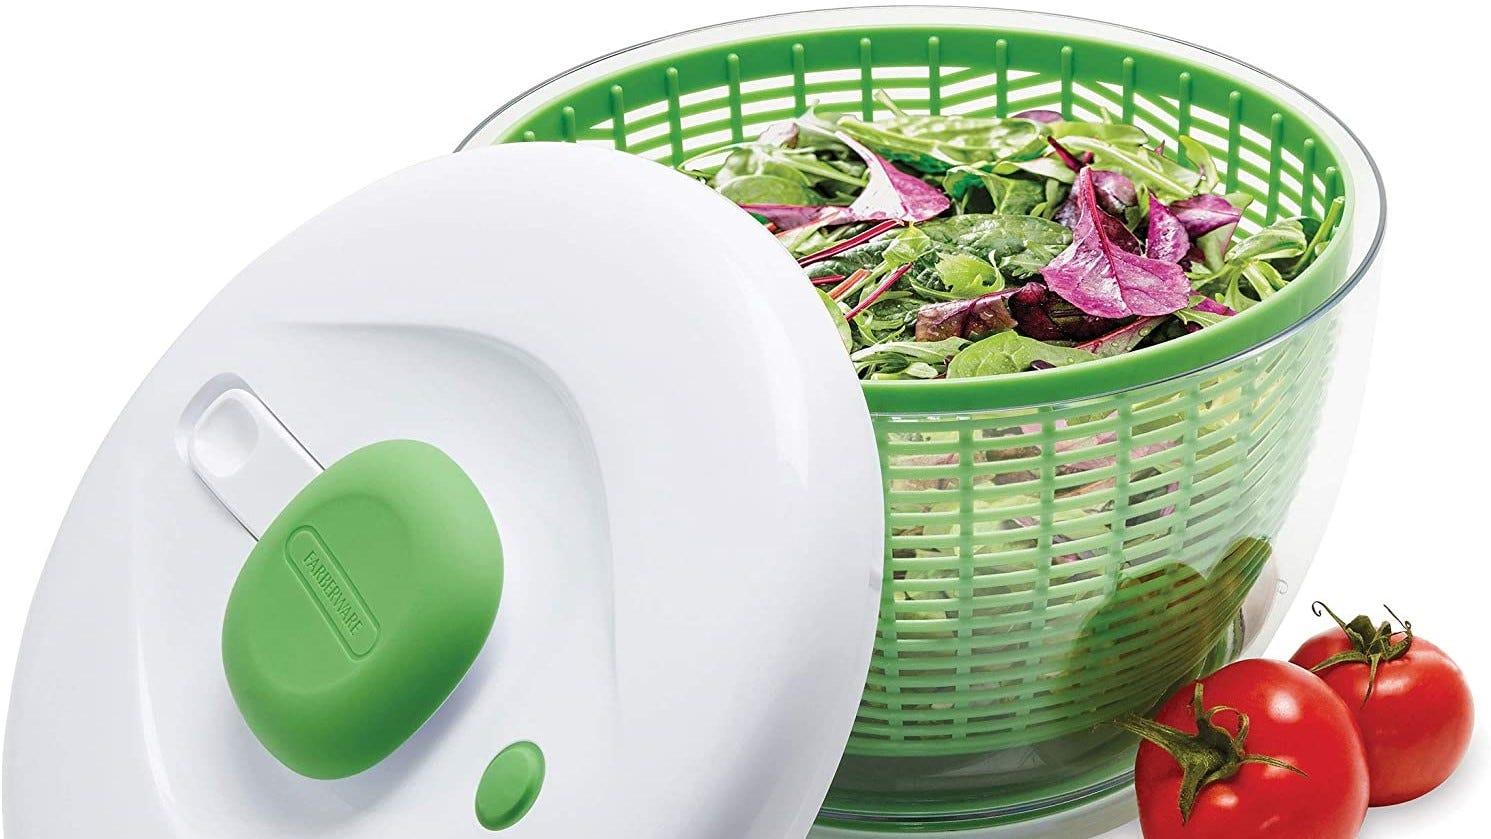 Salad spinner with lettuce inside.